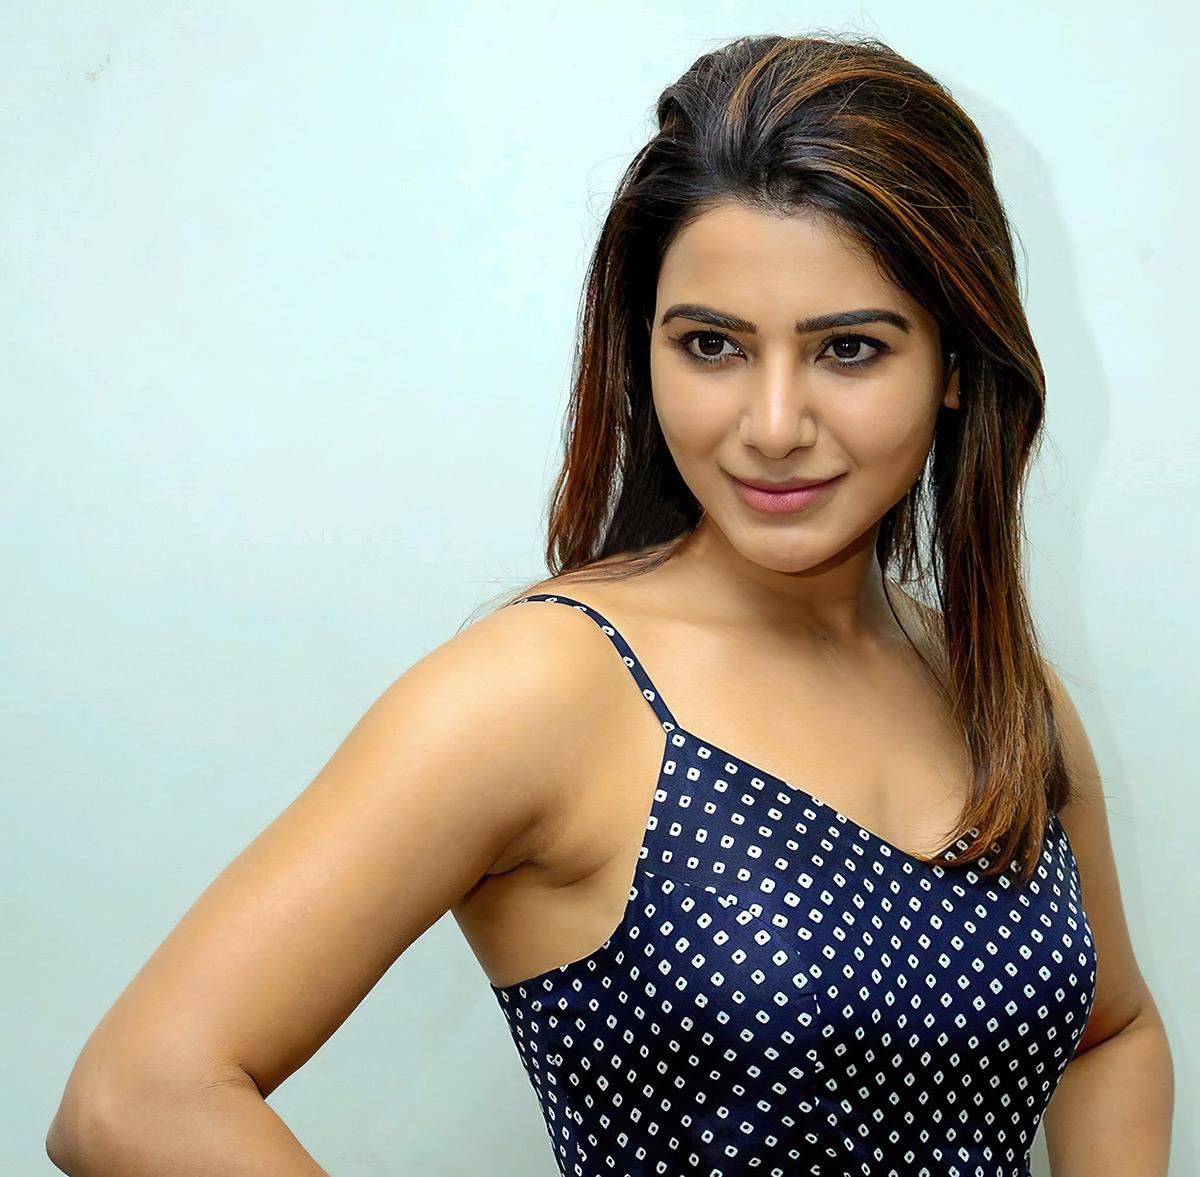 Samantha drops 'Akkineni': What is happening? - Tamil News - IndiaGlitz.com